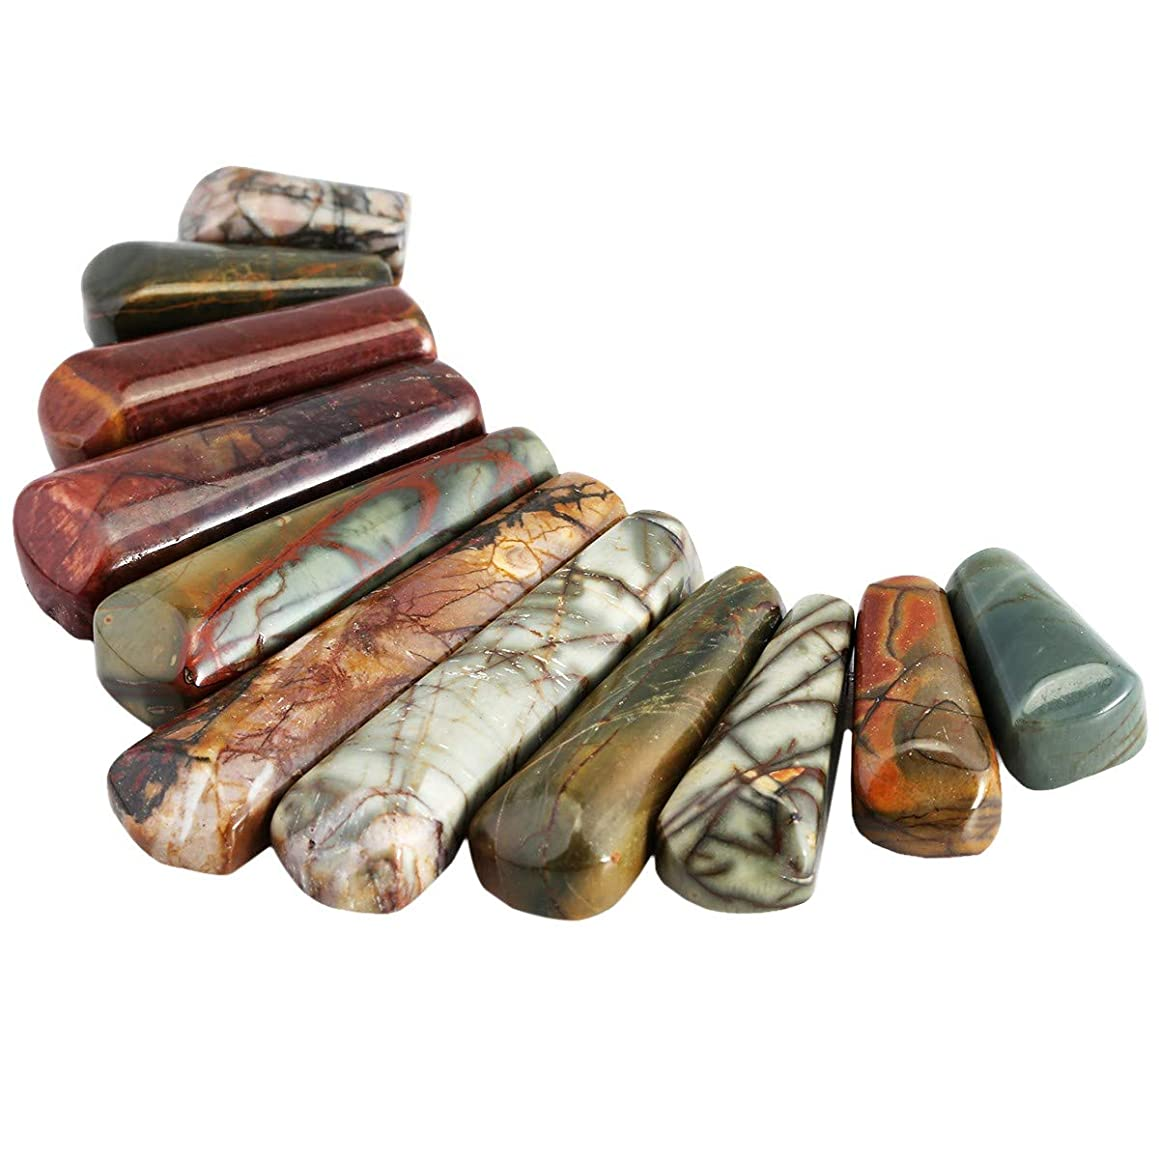 Nupuyai Polished Stone Loose Beads for Jewelry Making, Top Drilled Gradutated Sticks Pendant Beads Set